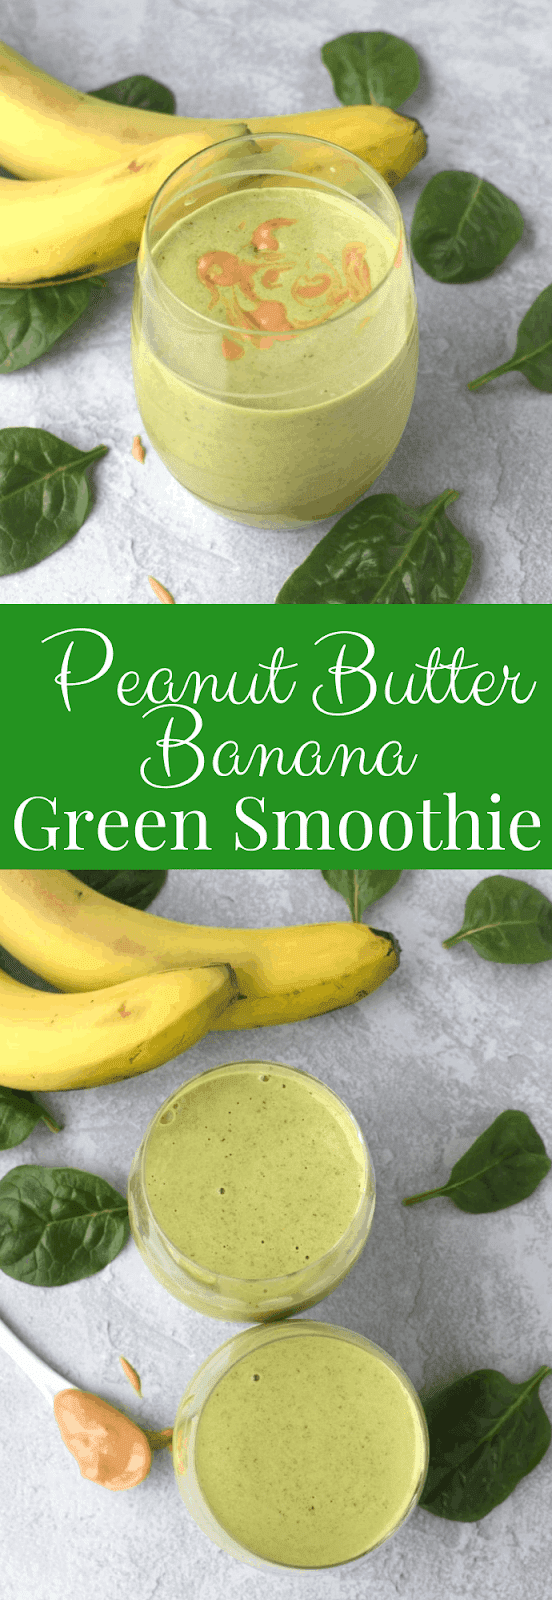 Peanut Butter Banana Green Smoothie recipe